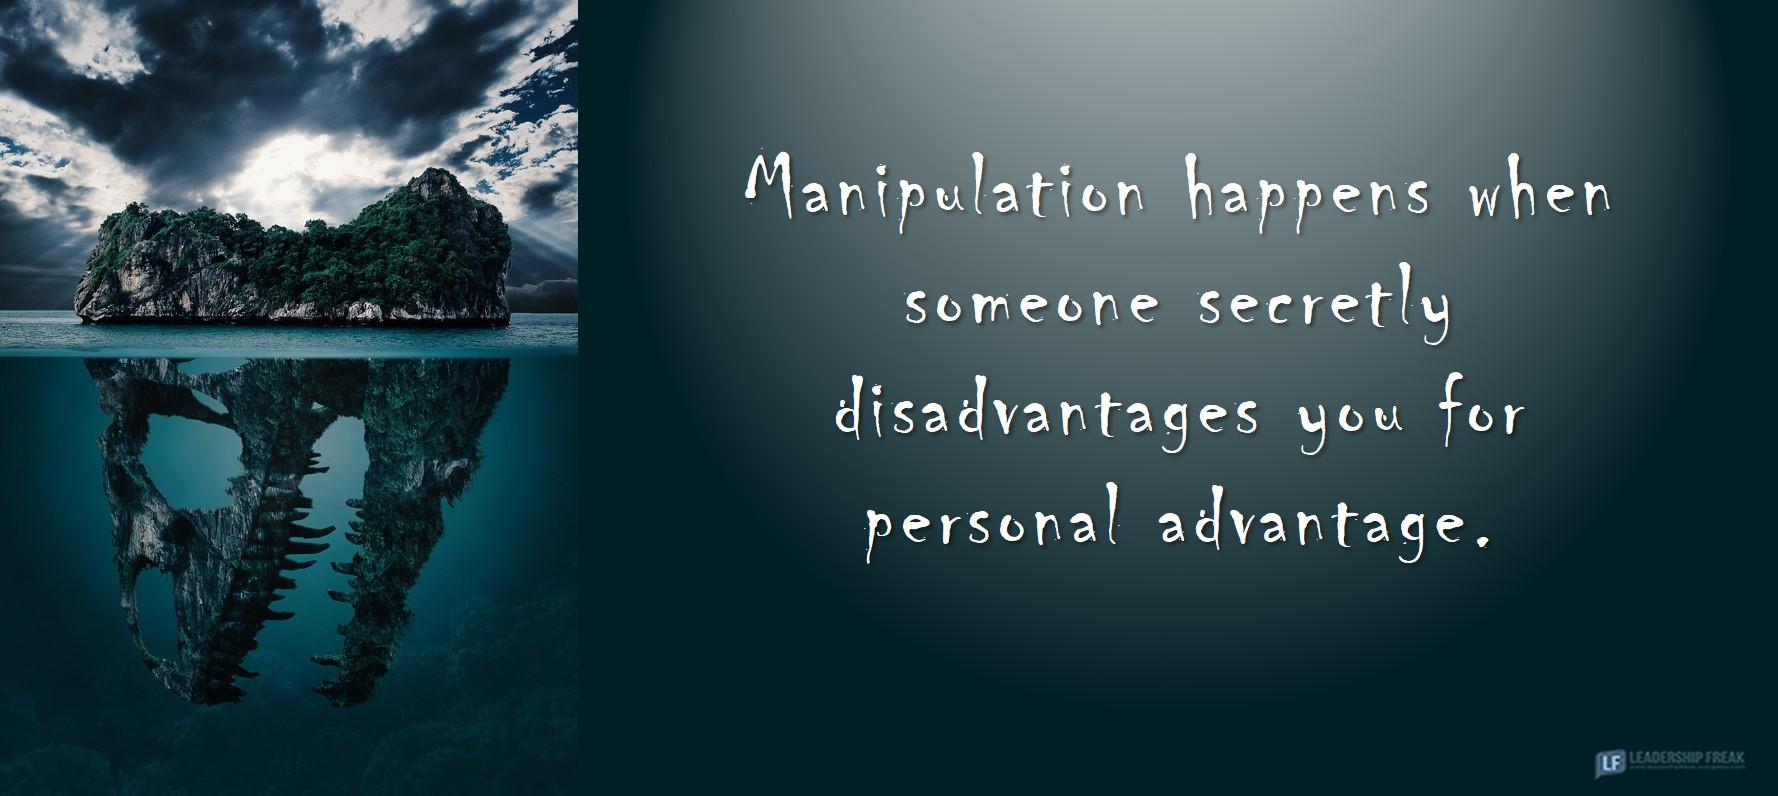 Dinosaur island.  Manipulation happens when someone secretly disadvantages you for personal advantage.